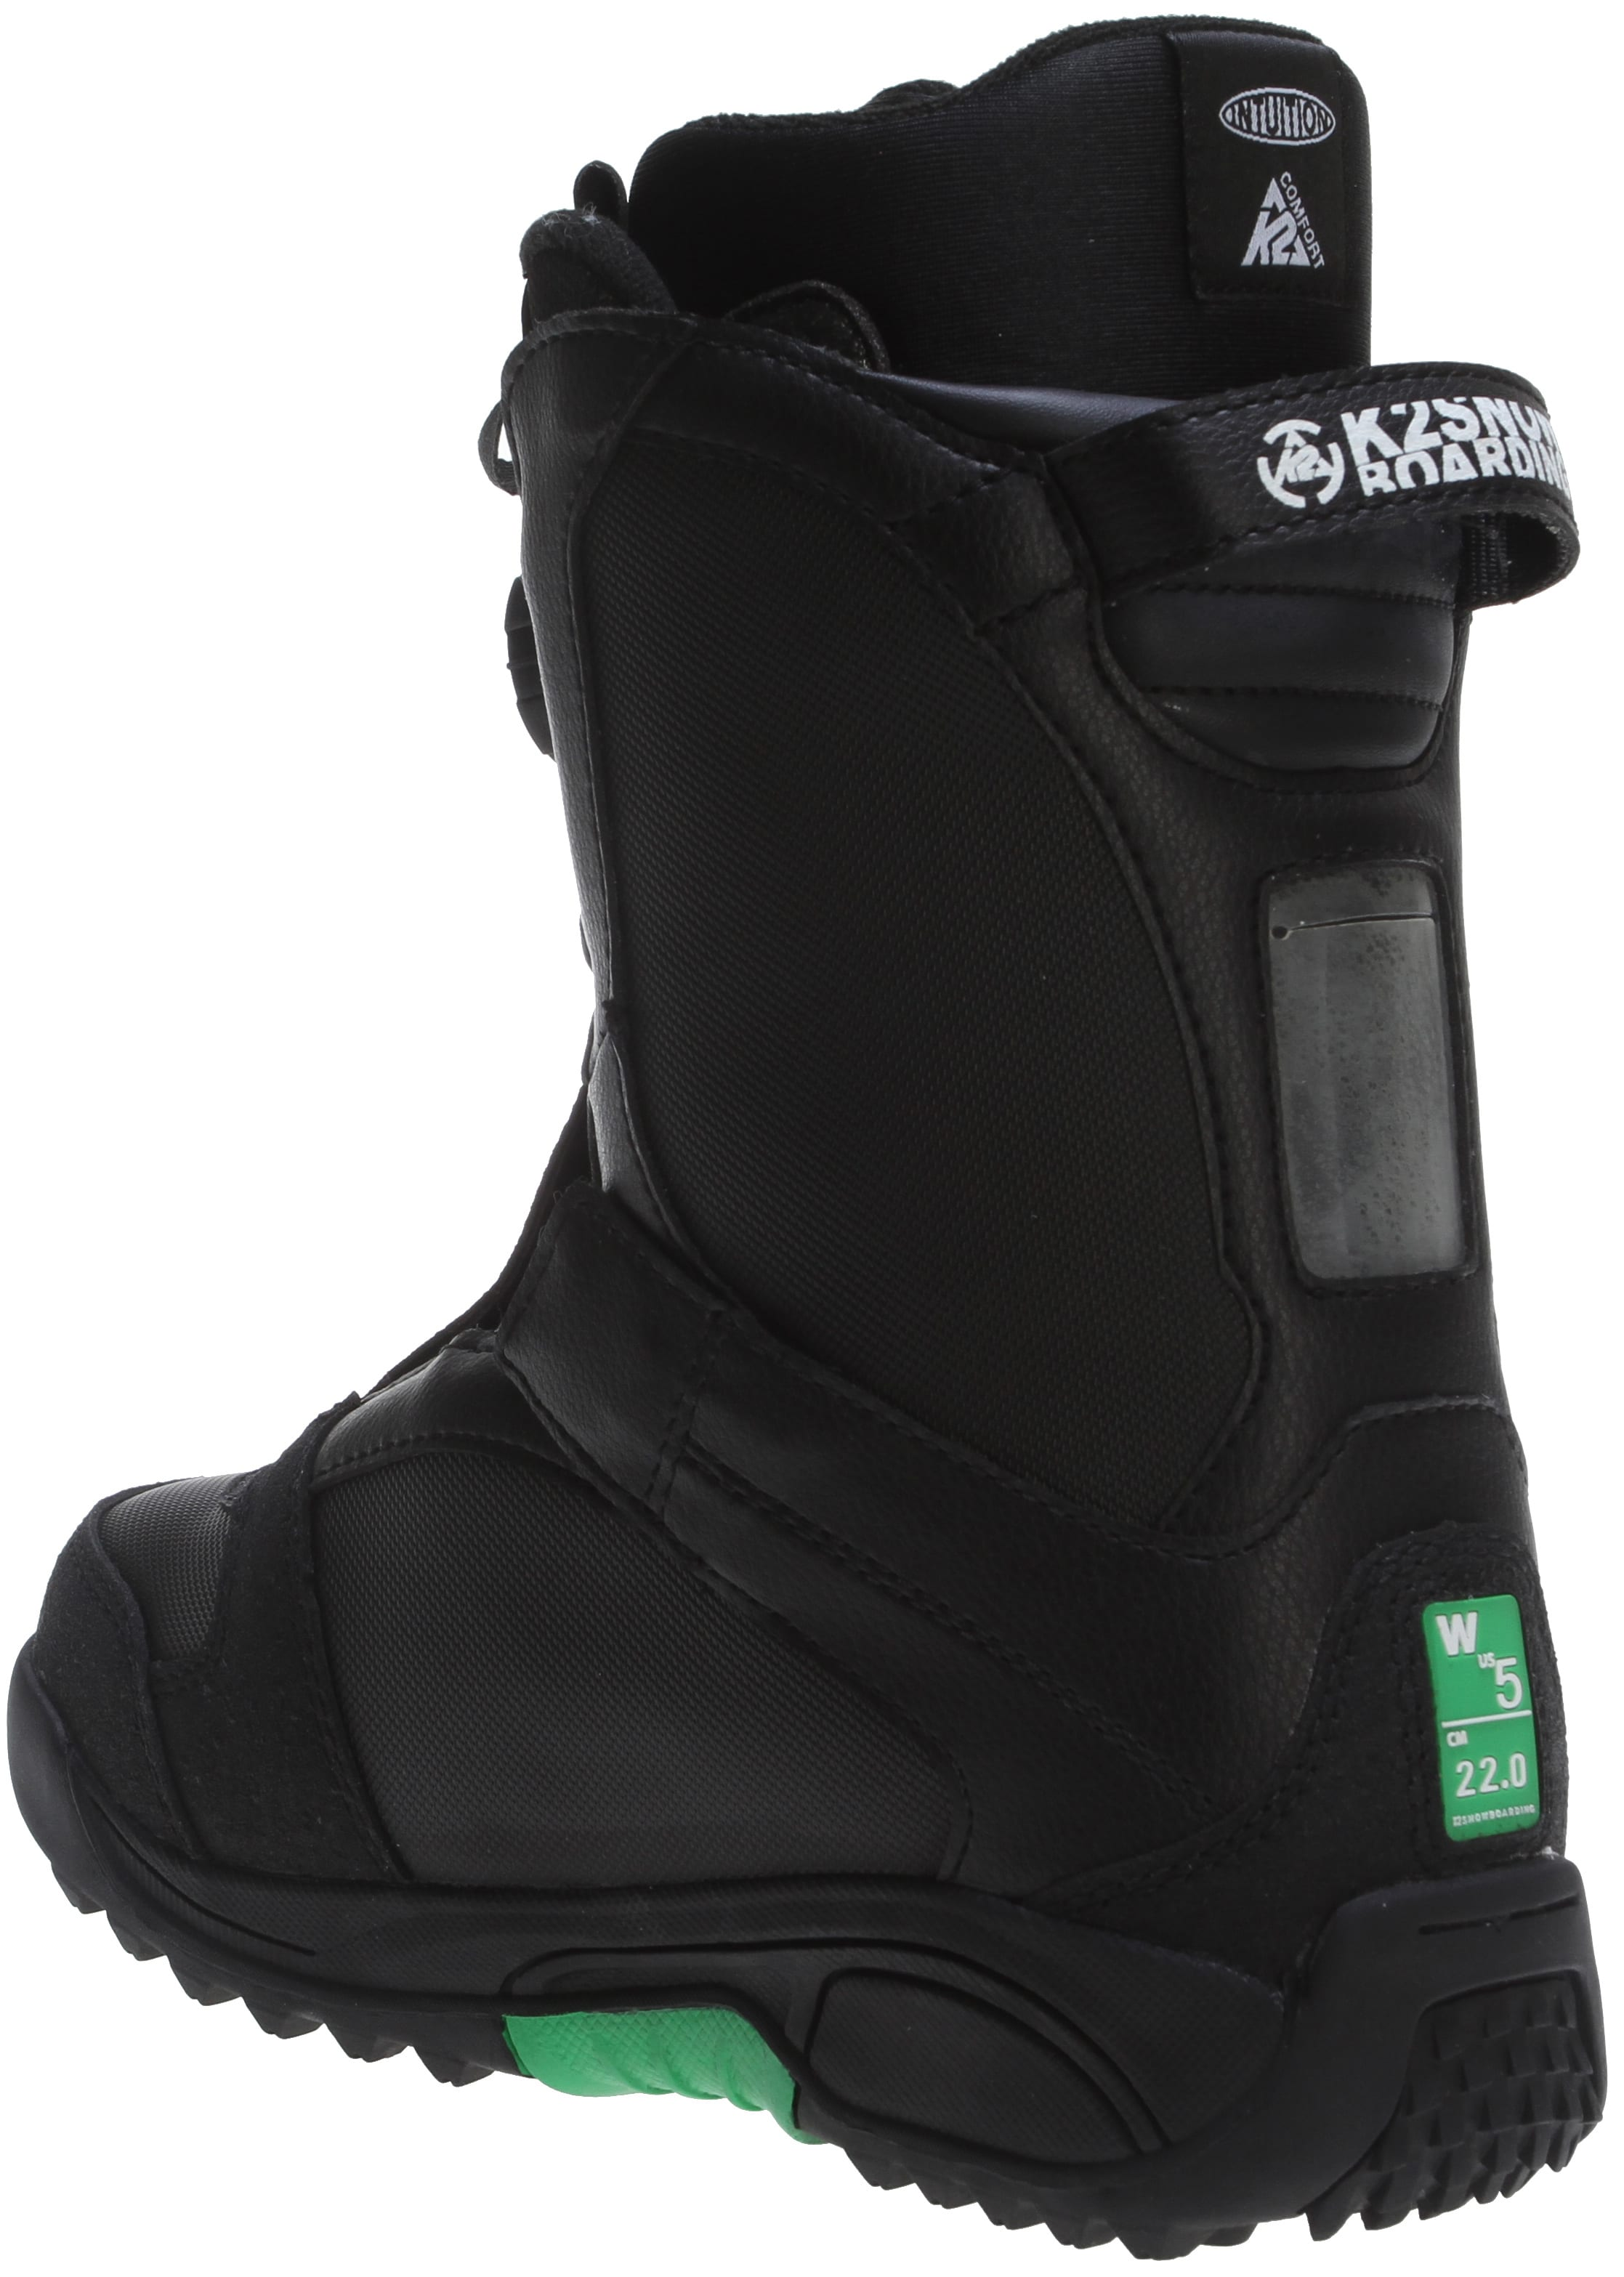 K2 Raider BOA Snowboard Boots - Womens